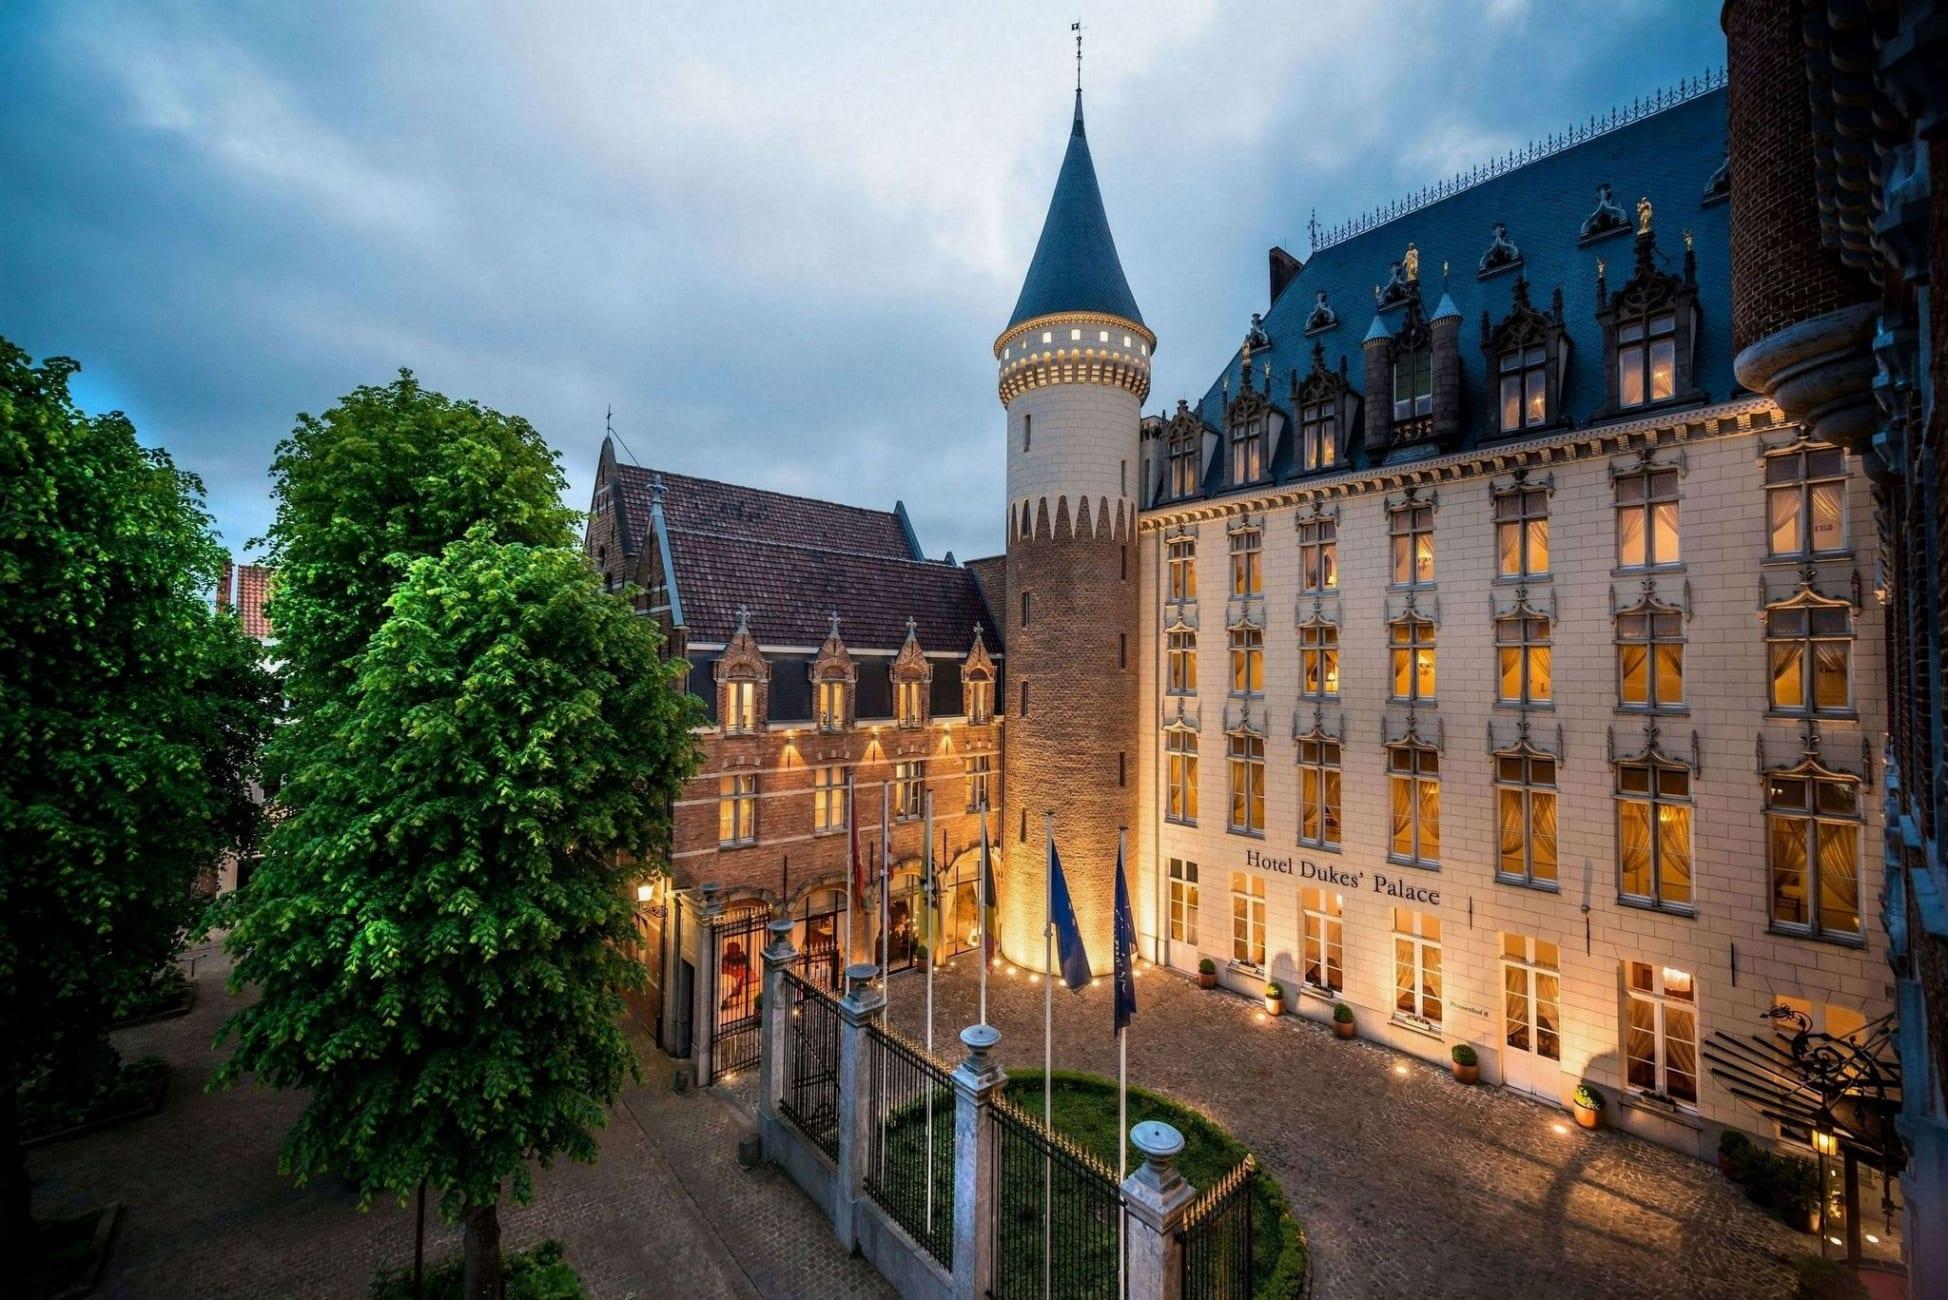 Il Prinsenhof, oggi hotel Dukes' Palace